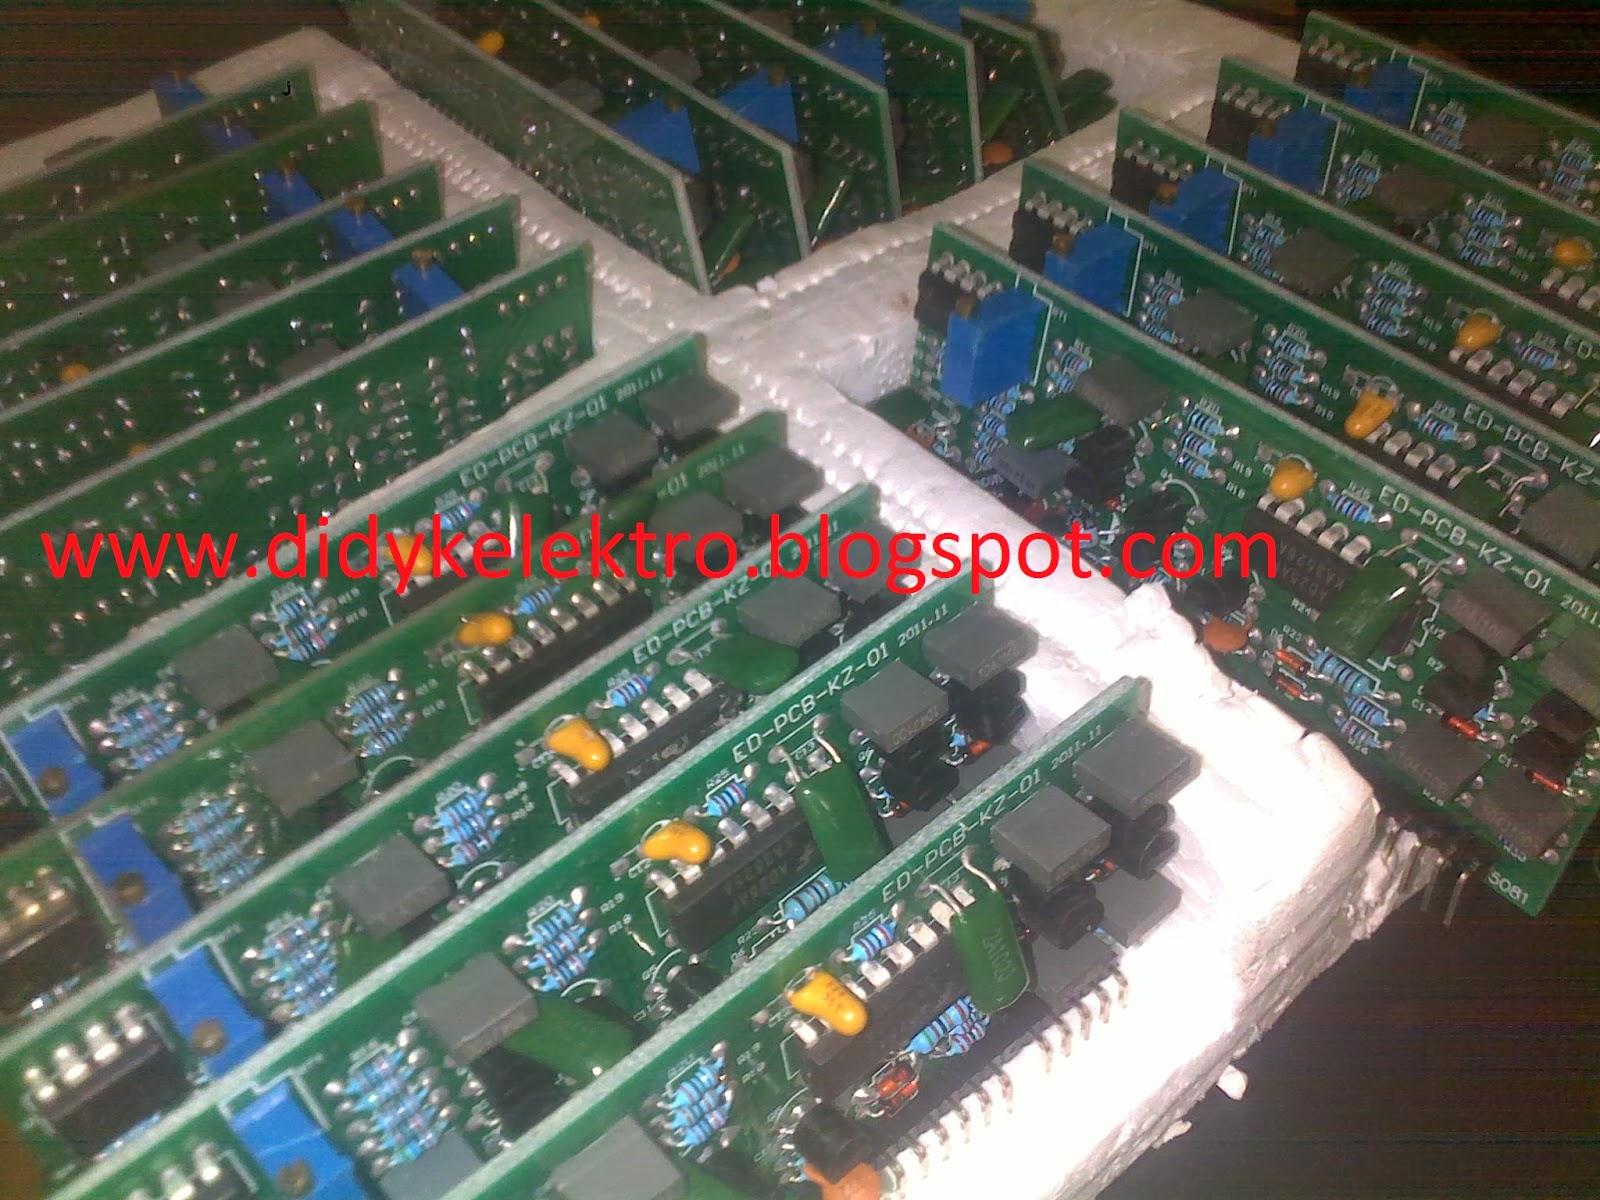 Didykelektro Sparepart Mesin Las Komponen Mosfet 23n50e 23n50 Original Pcb Control Pwm